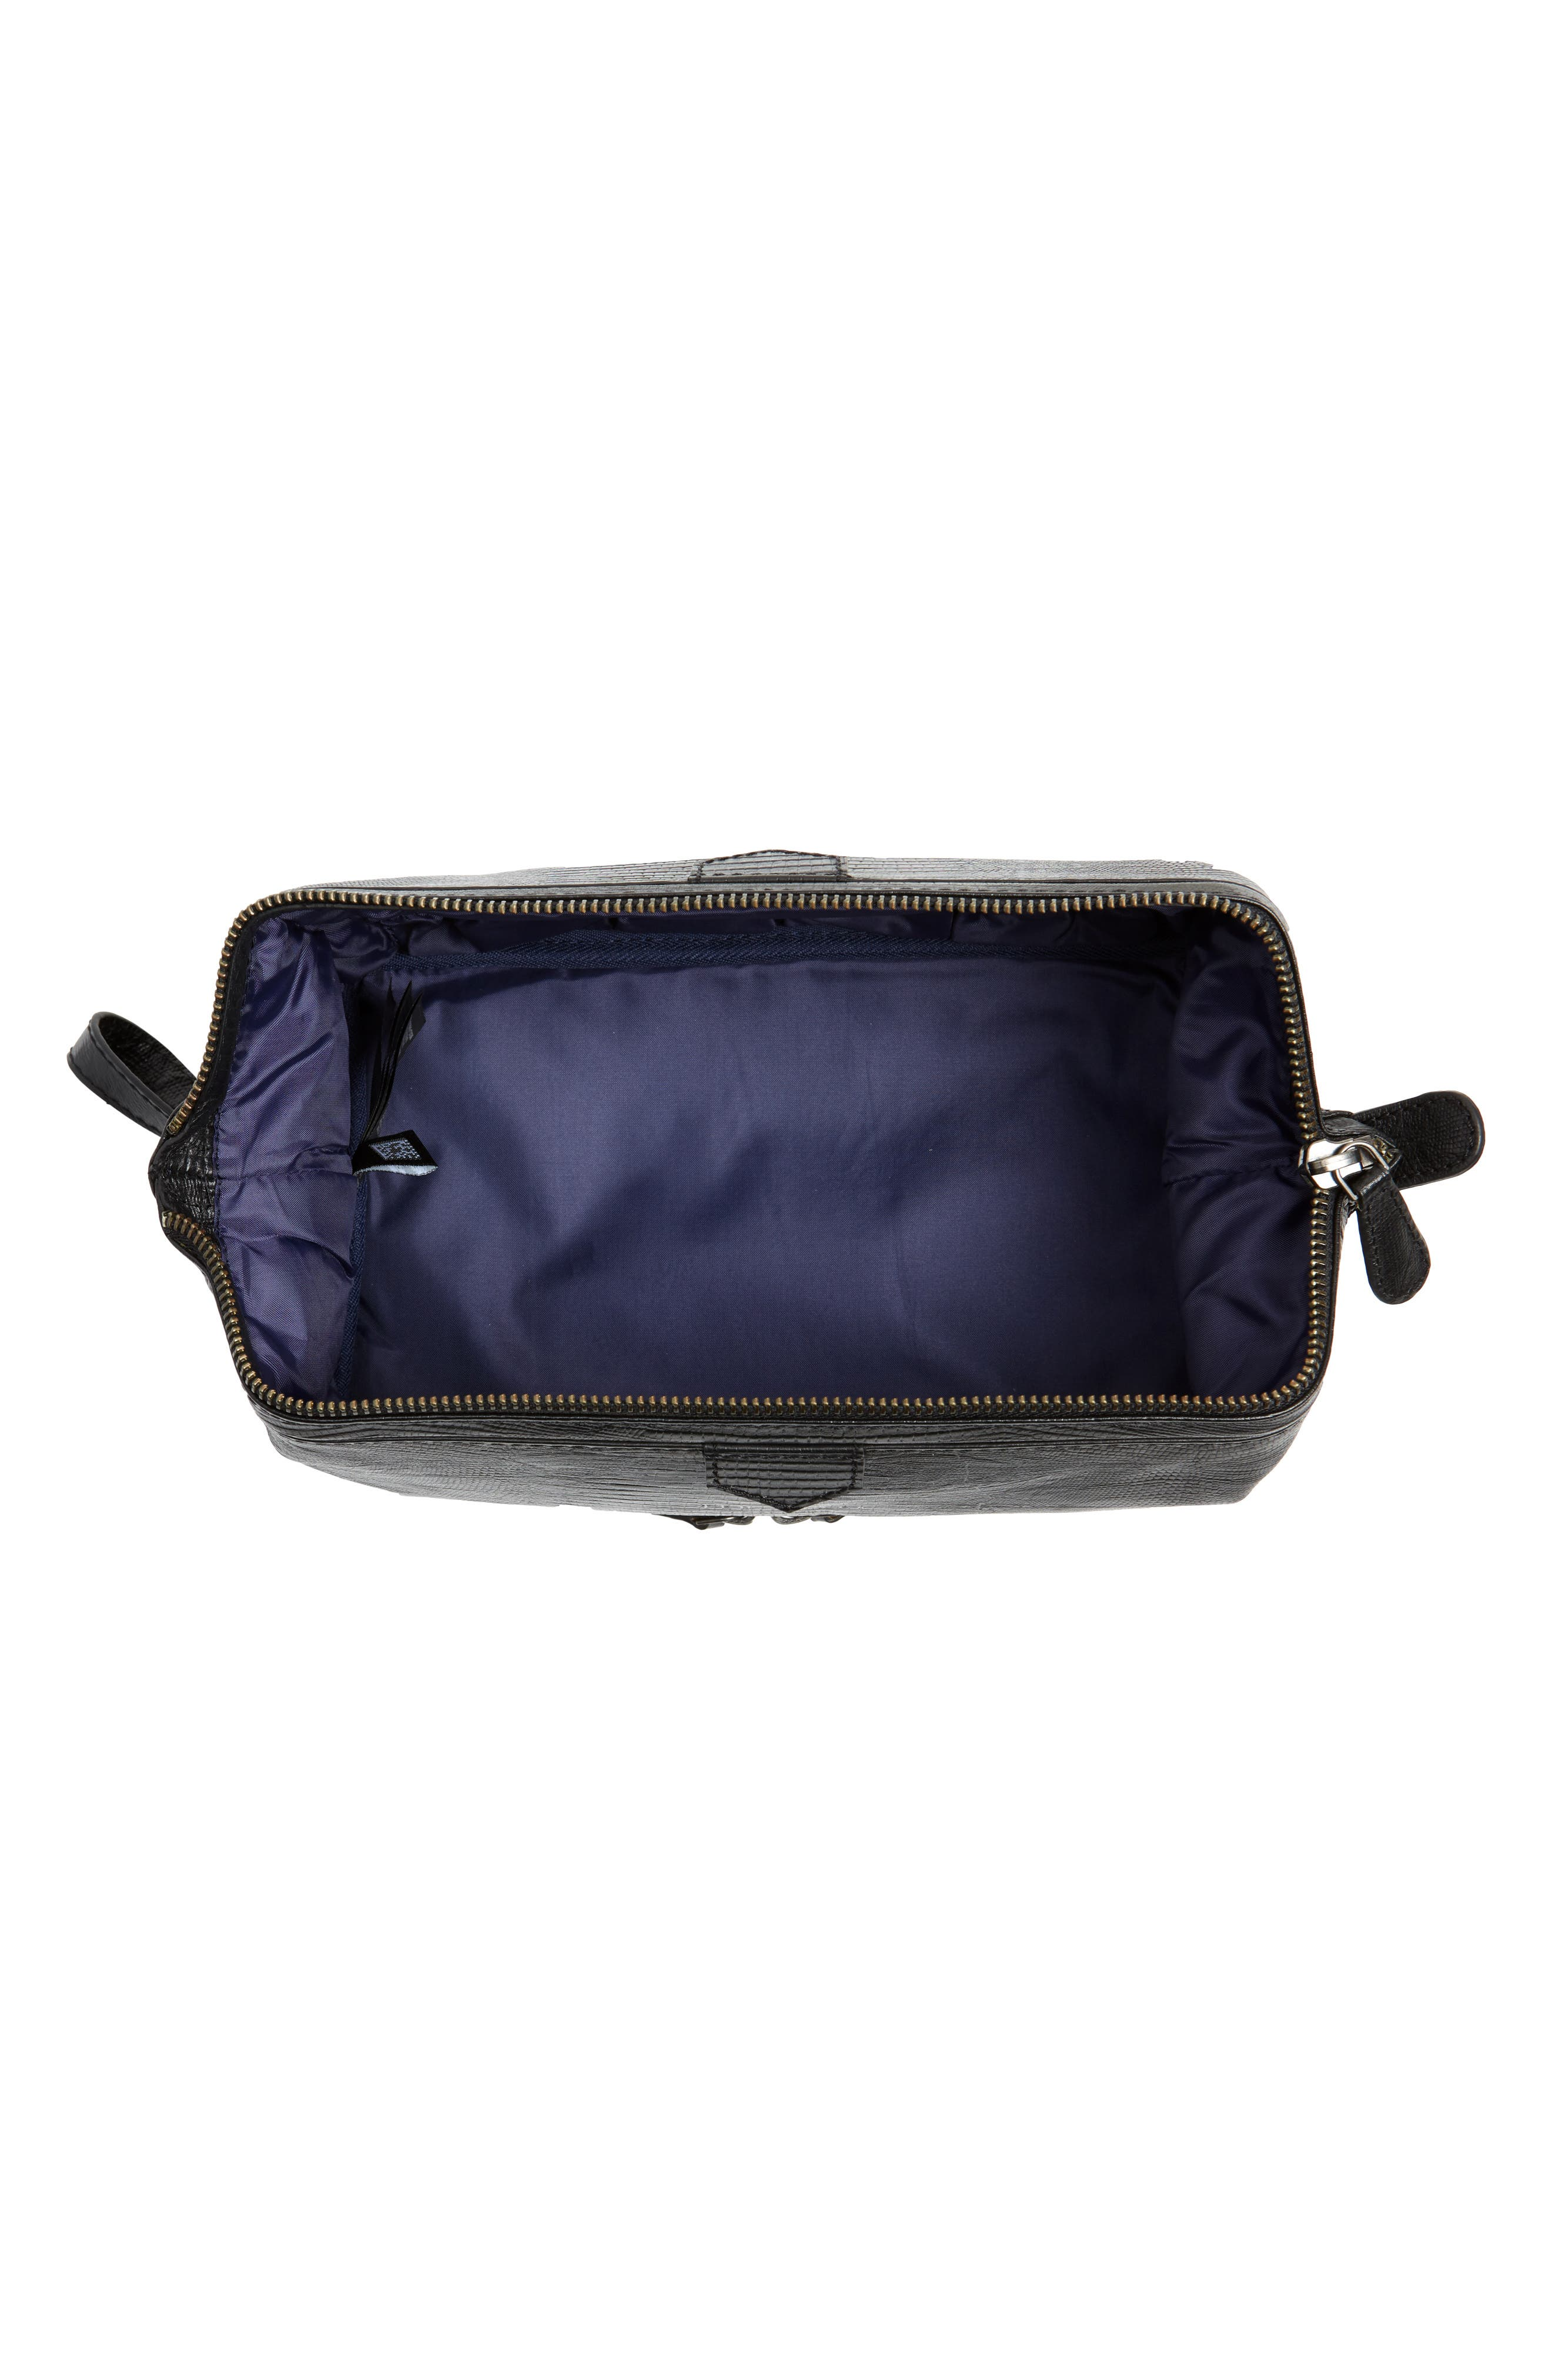 TED BAKER LONDON,                             Leather Travel Kit,                             Alternate thumbnail 3, color,                             BLACK